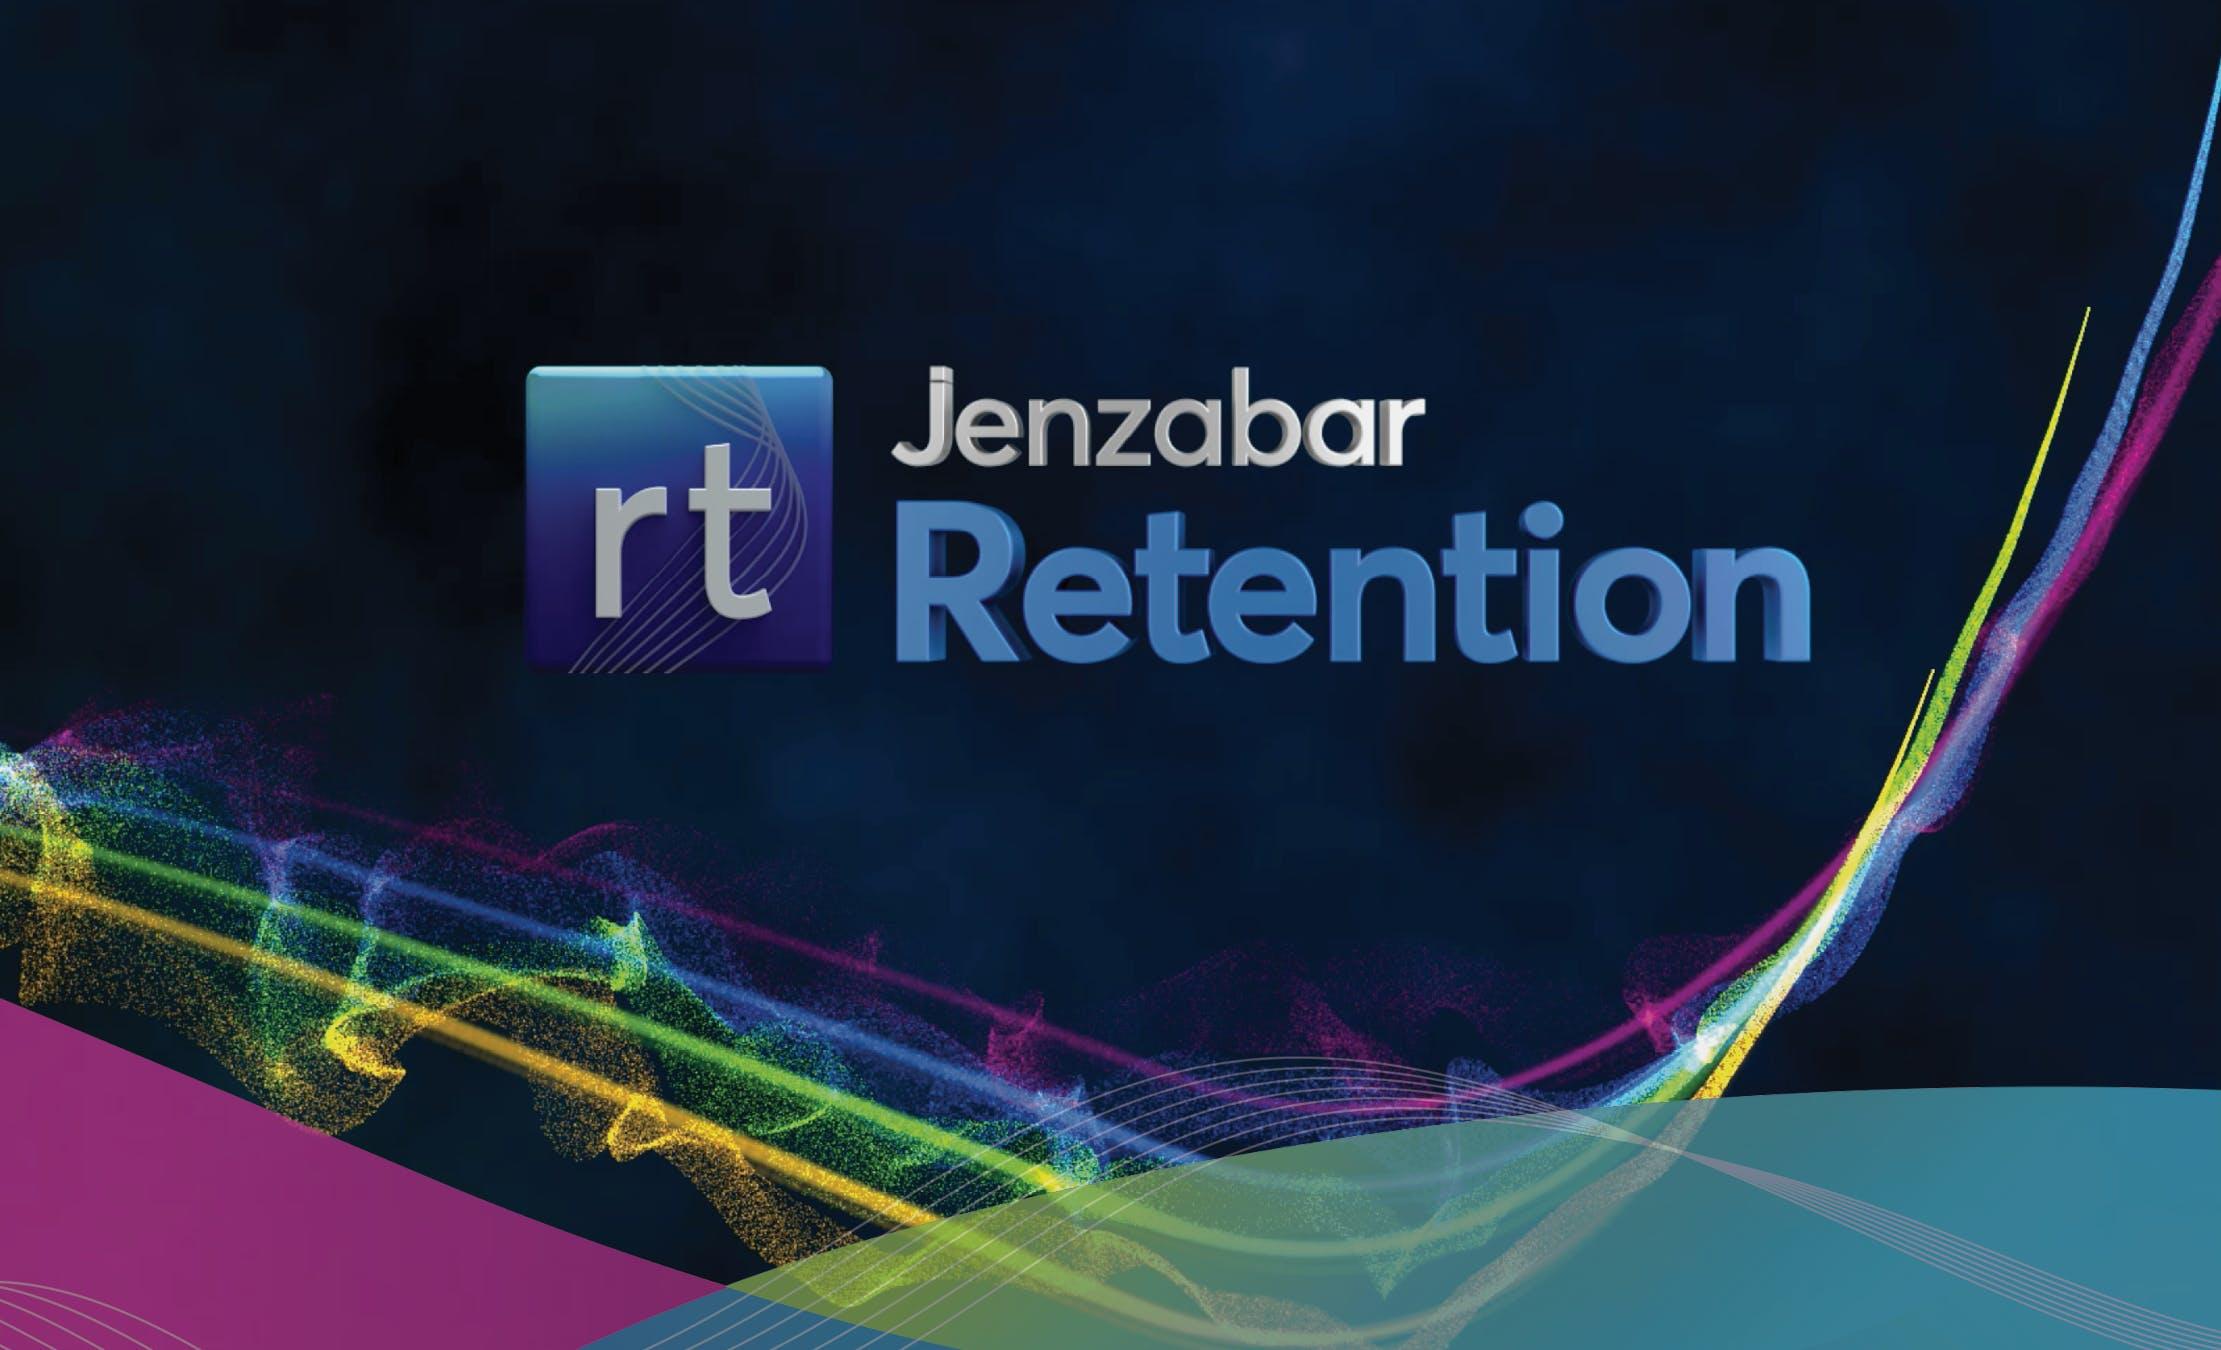 Jenzabar Retention